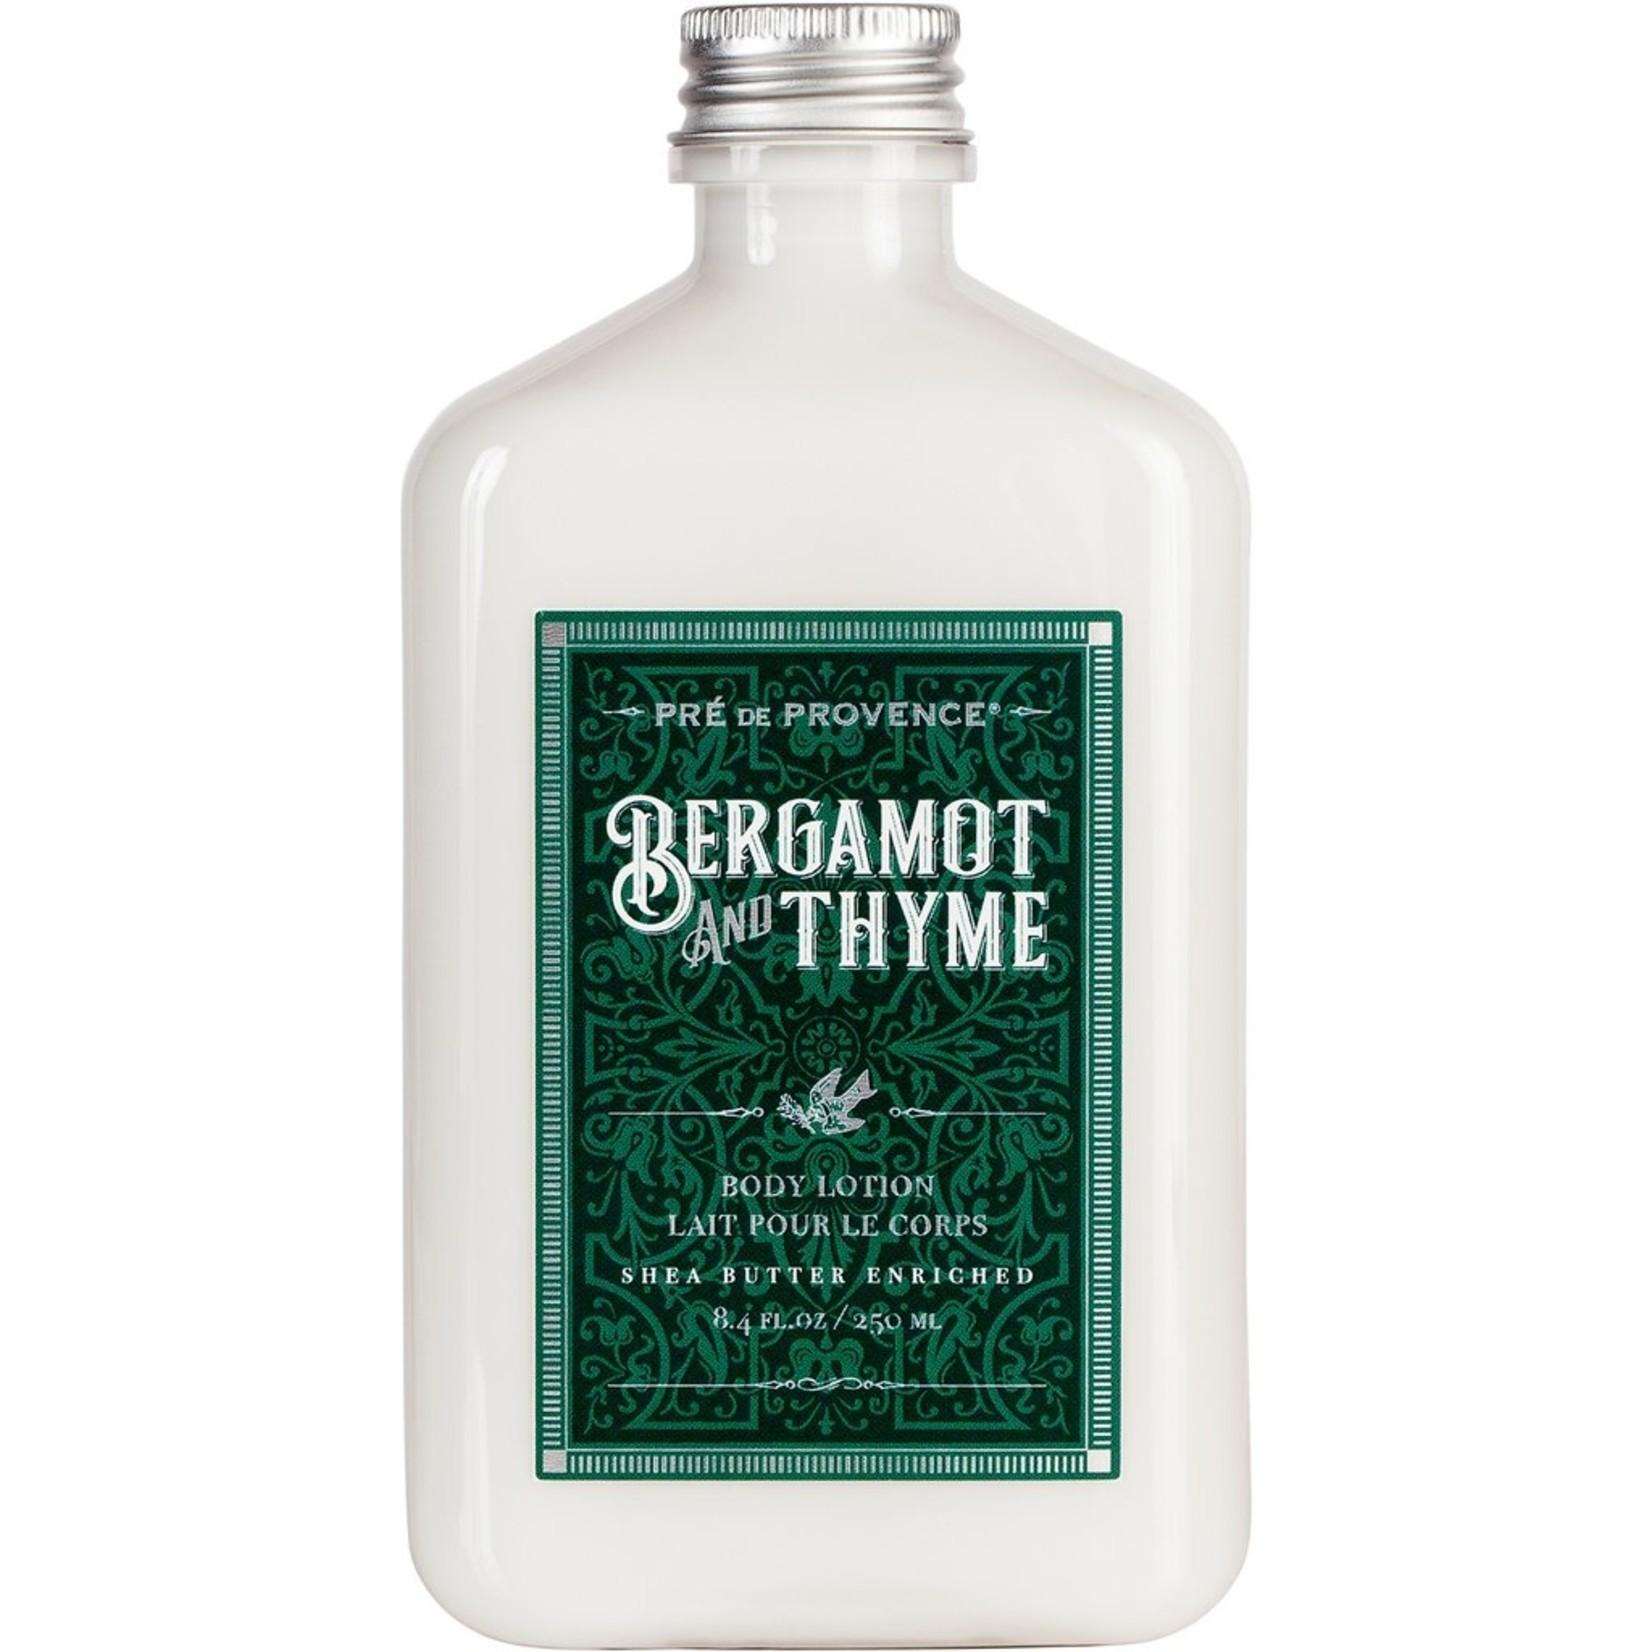 Pre de Provence Bergamot and Thyme Body Lotion